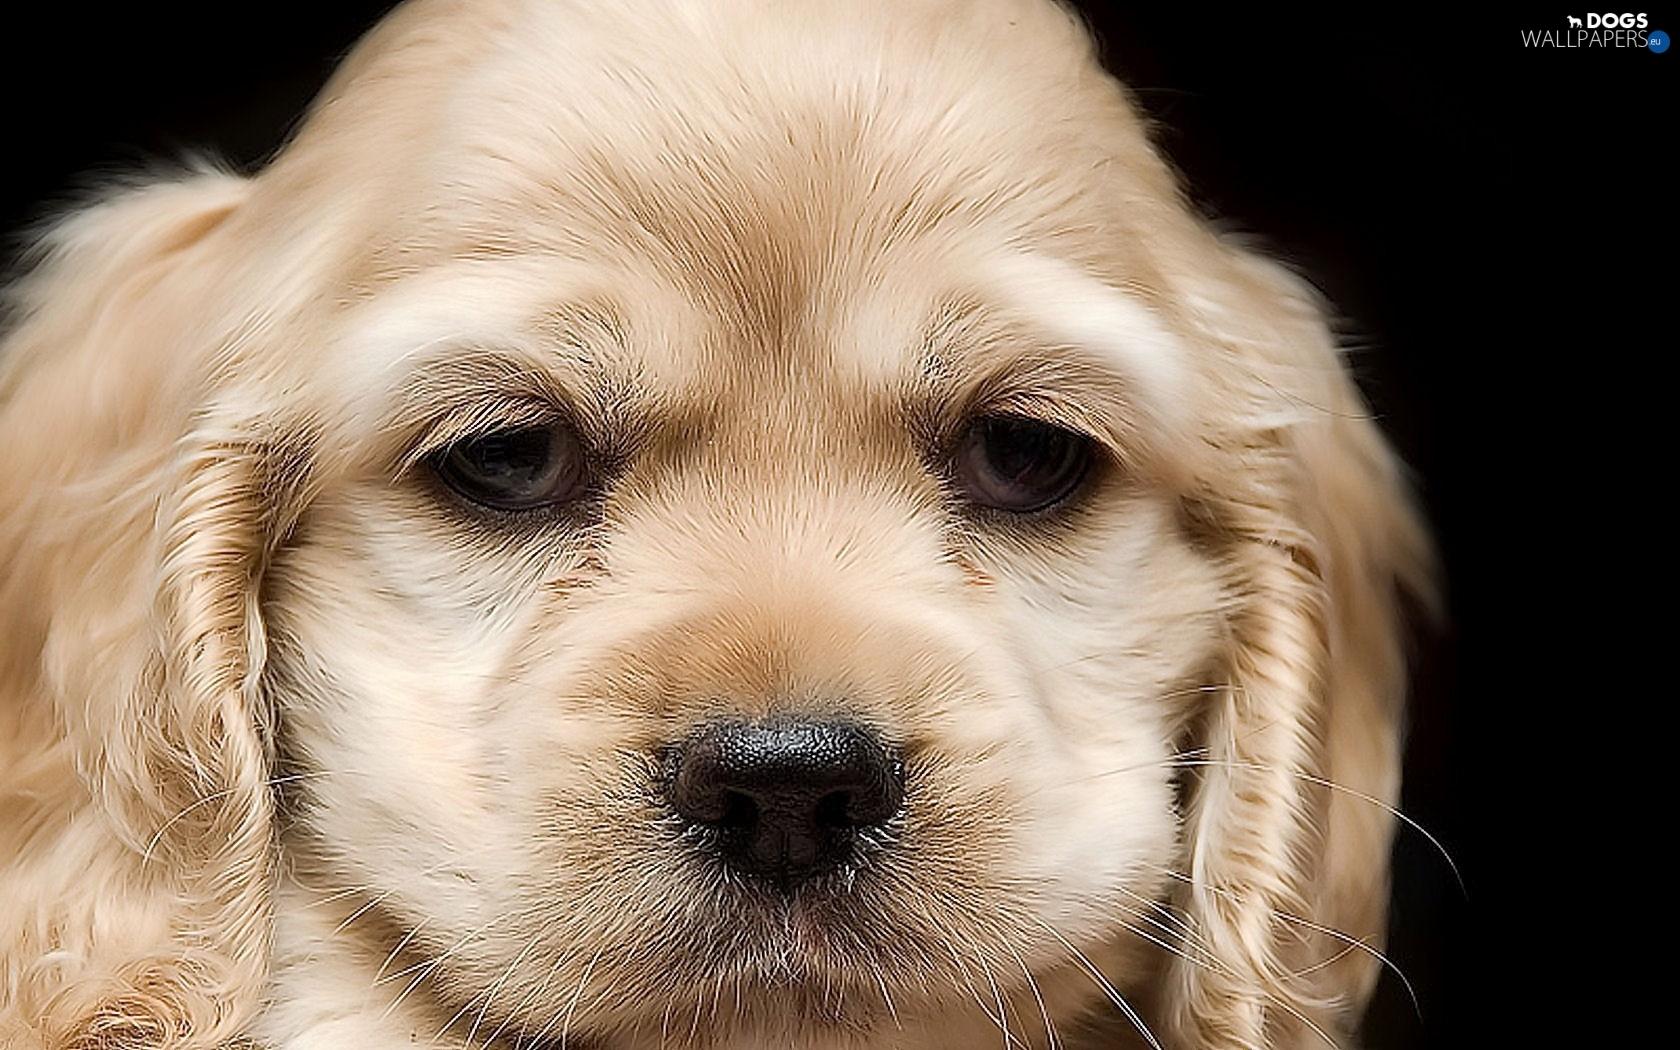 Dog cocker spaniel muzzle dogs wallpapers 1680x1050 - Free cocker spaniel screensavers ...